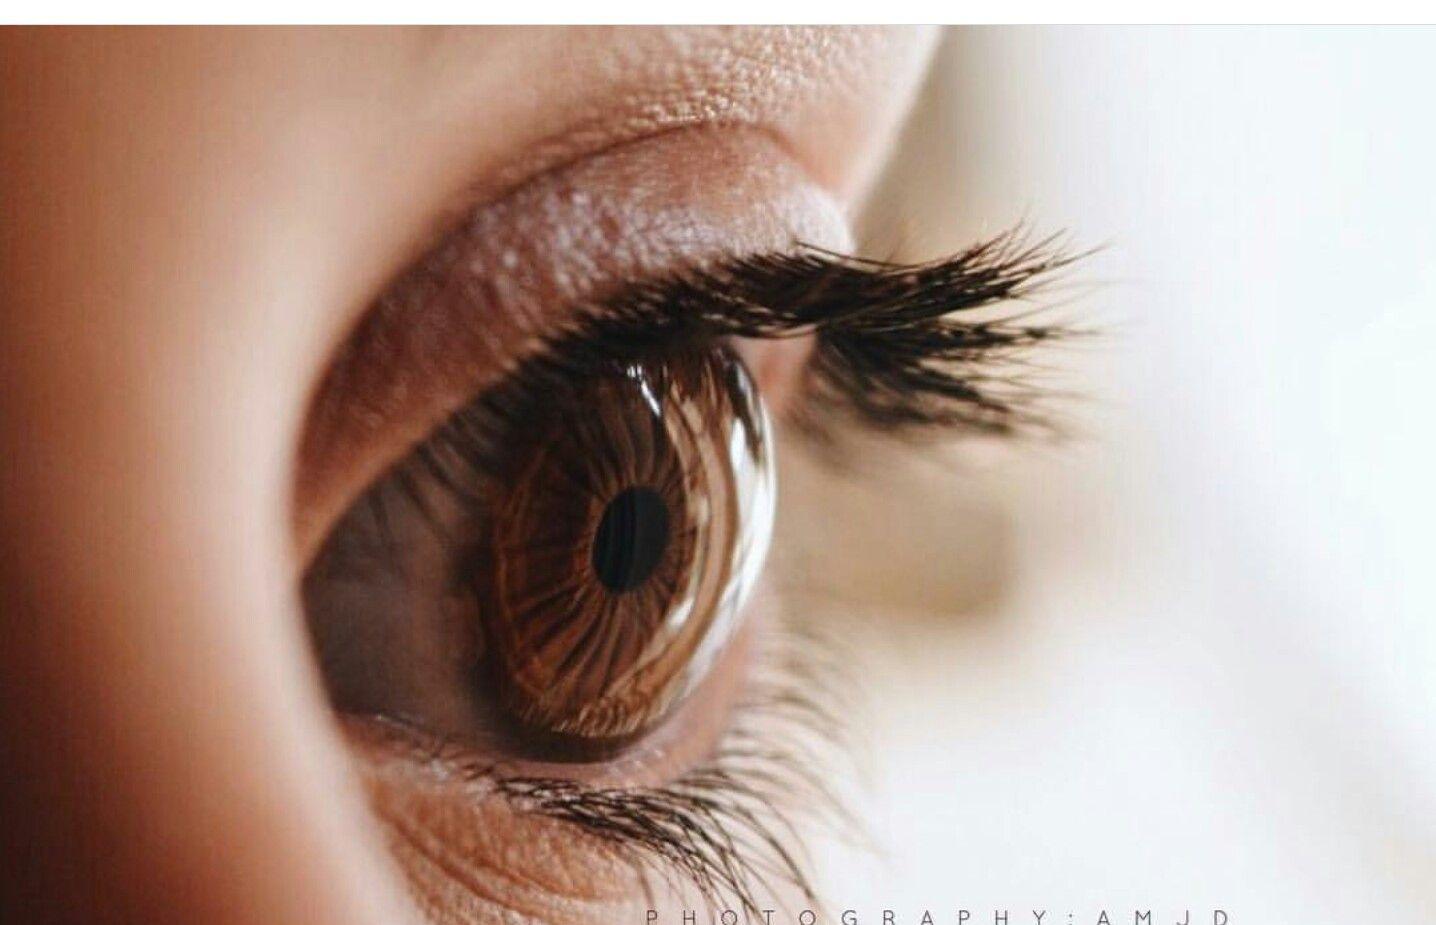 Pin by nancy on eye language pinterest language and photography